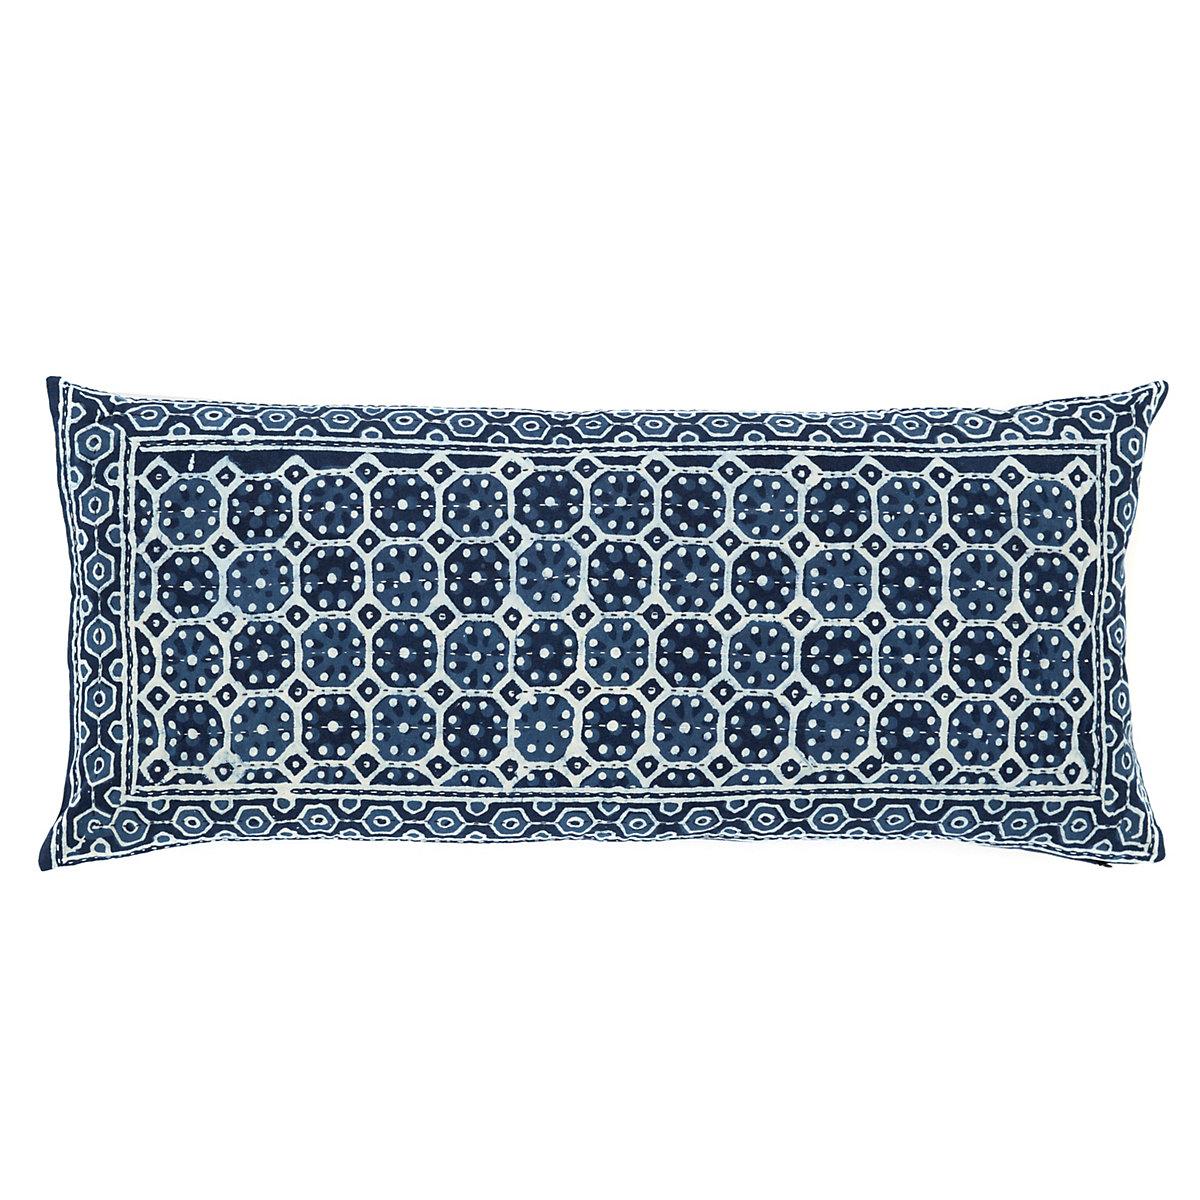 Navy blue and yellow decorative pillows - Resist Octagon Indigo Decorative Pillow